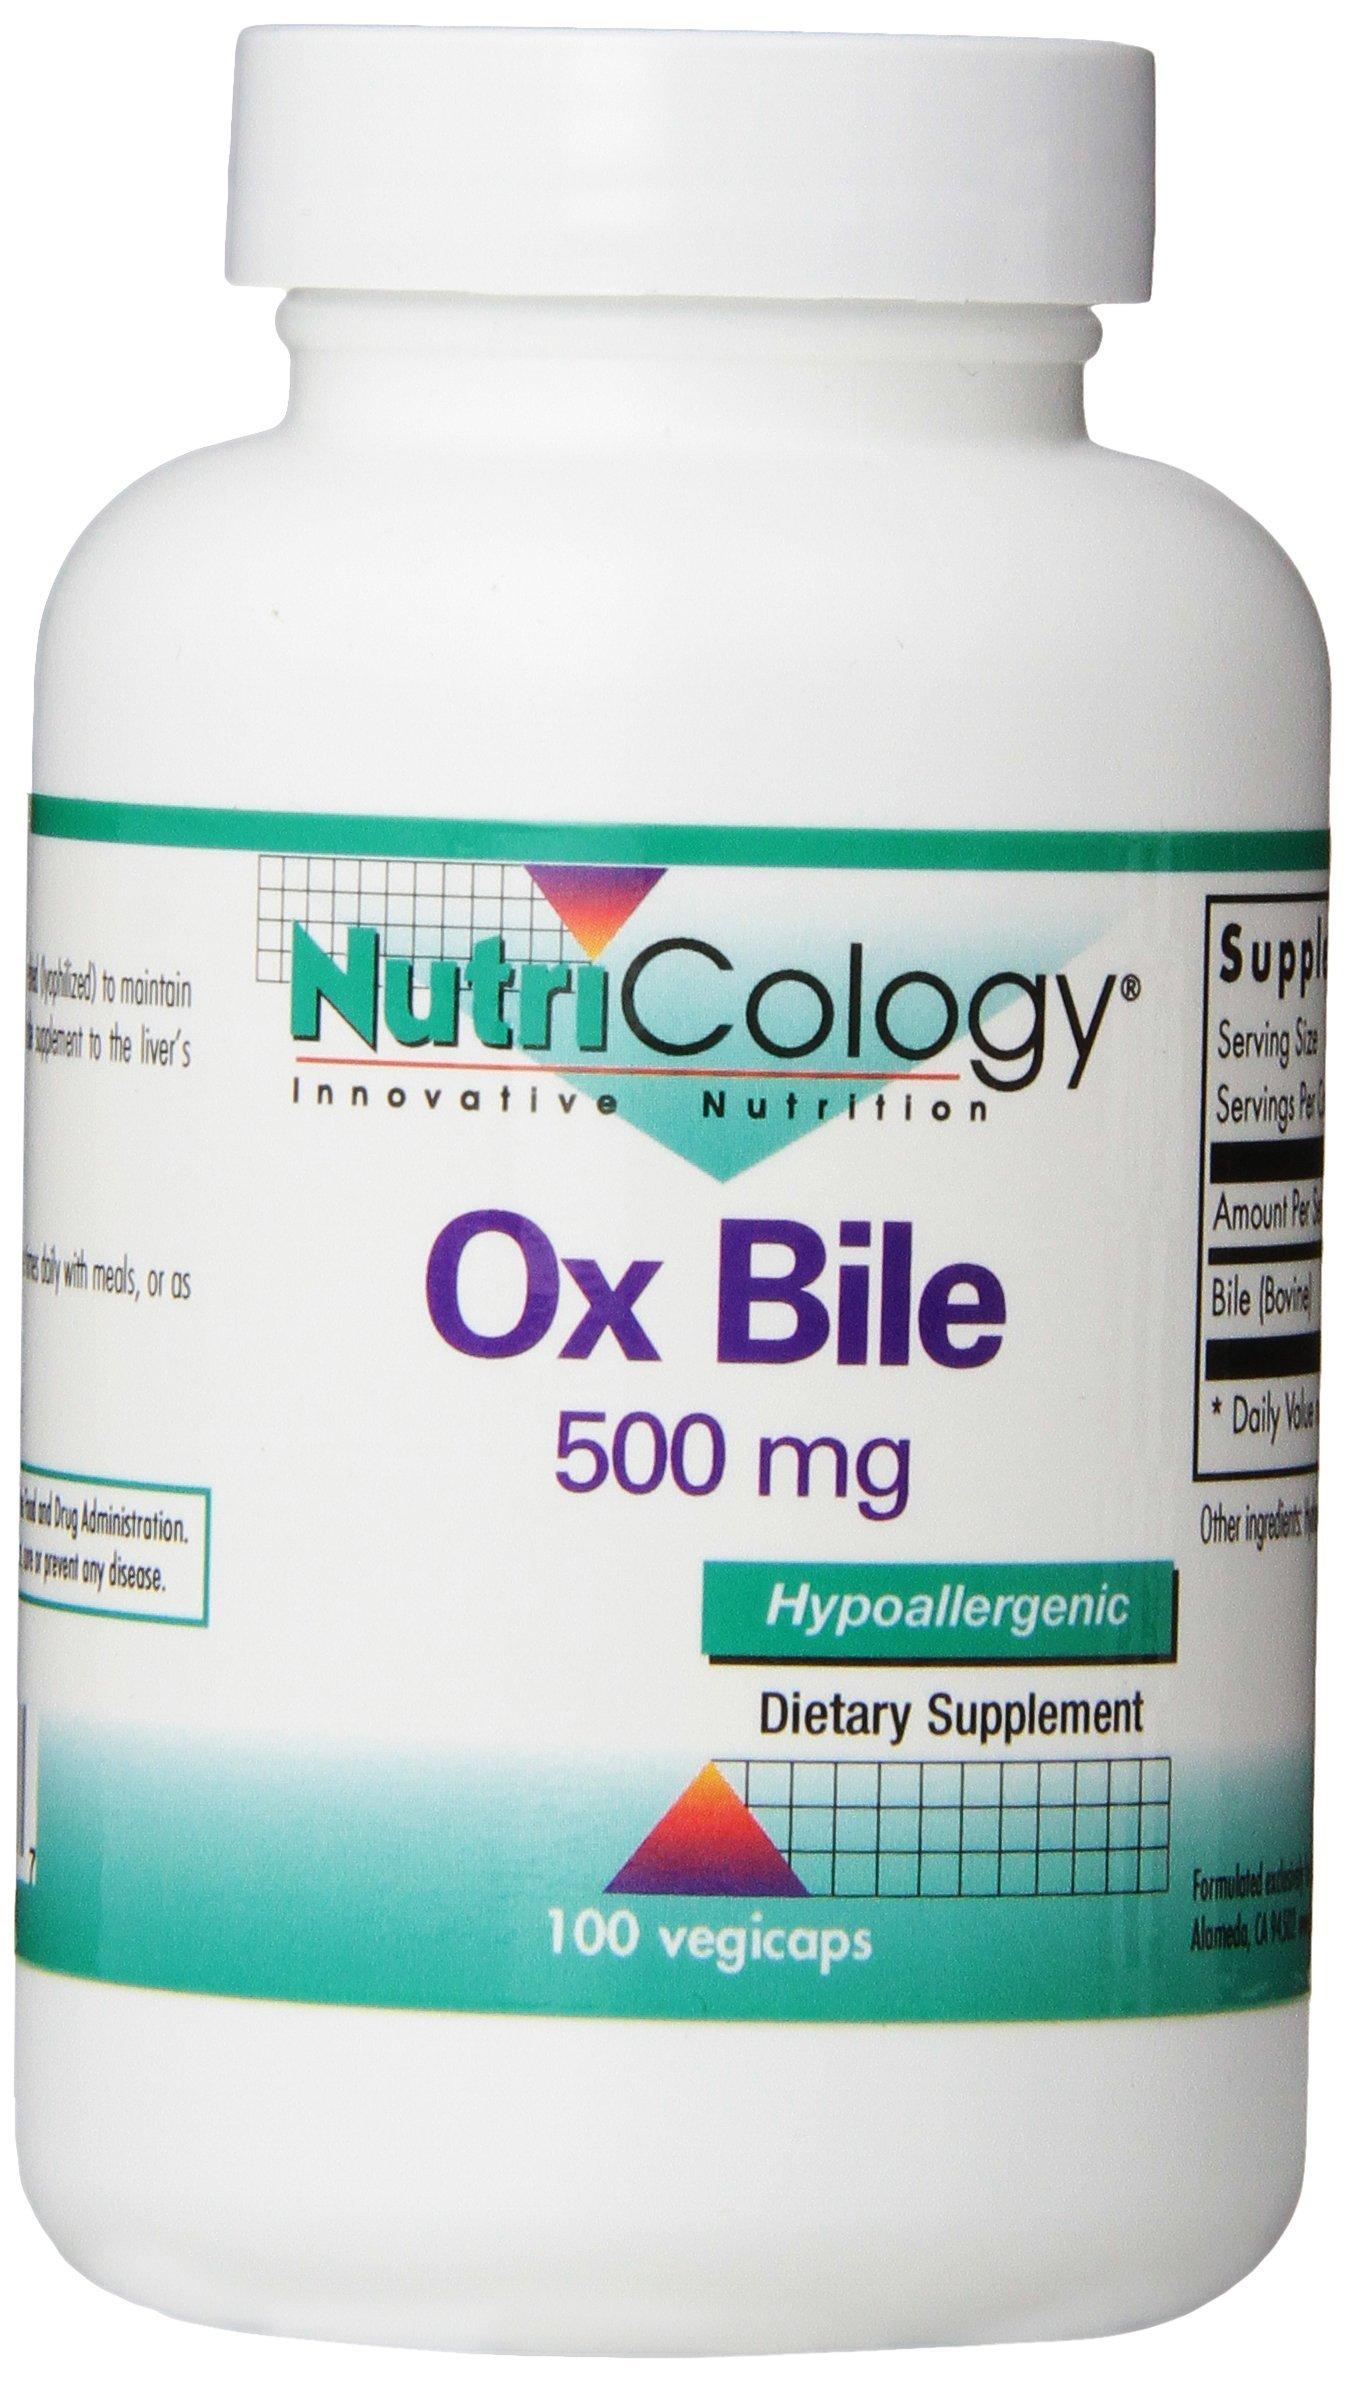 NutriCology Ox Bile 500 mg - Fat Digestion, Liver, Metabolic, GI Support - 100 Vegicaps